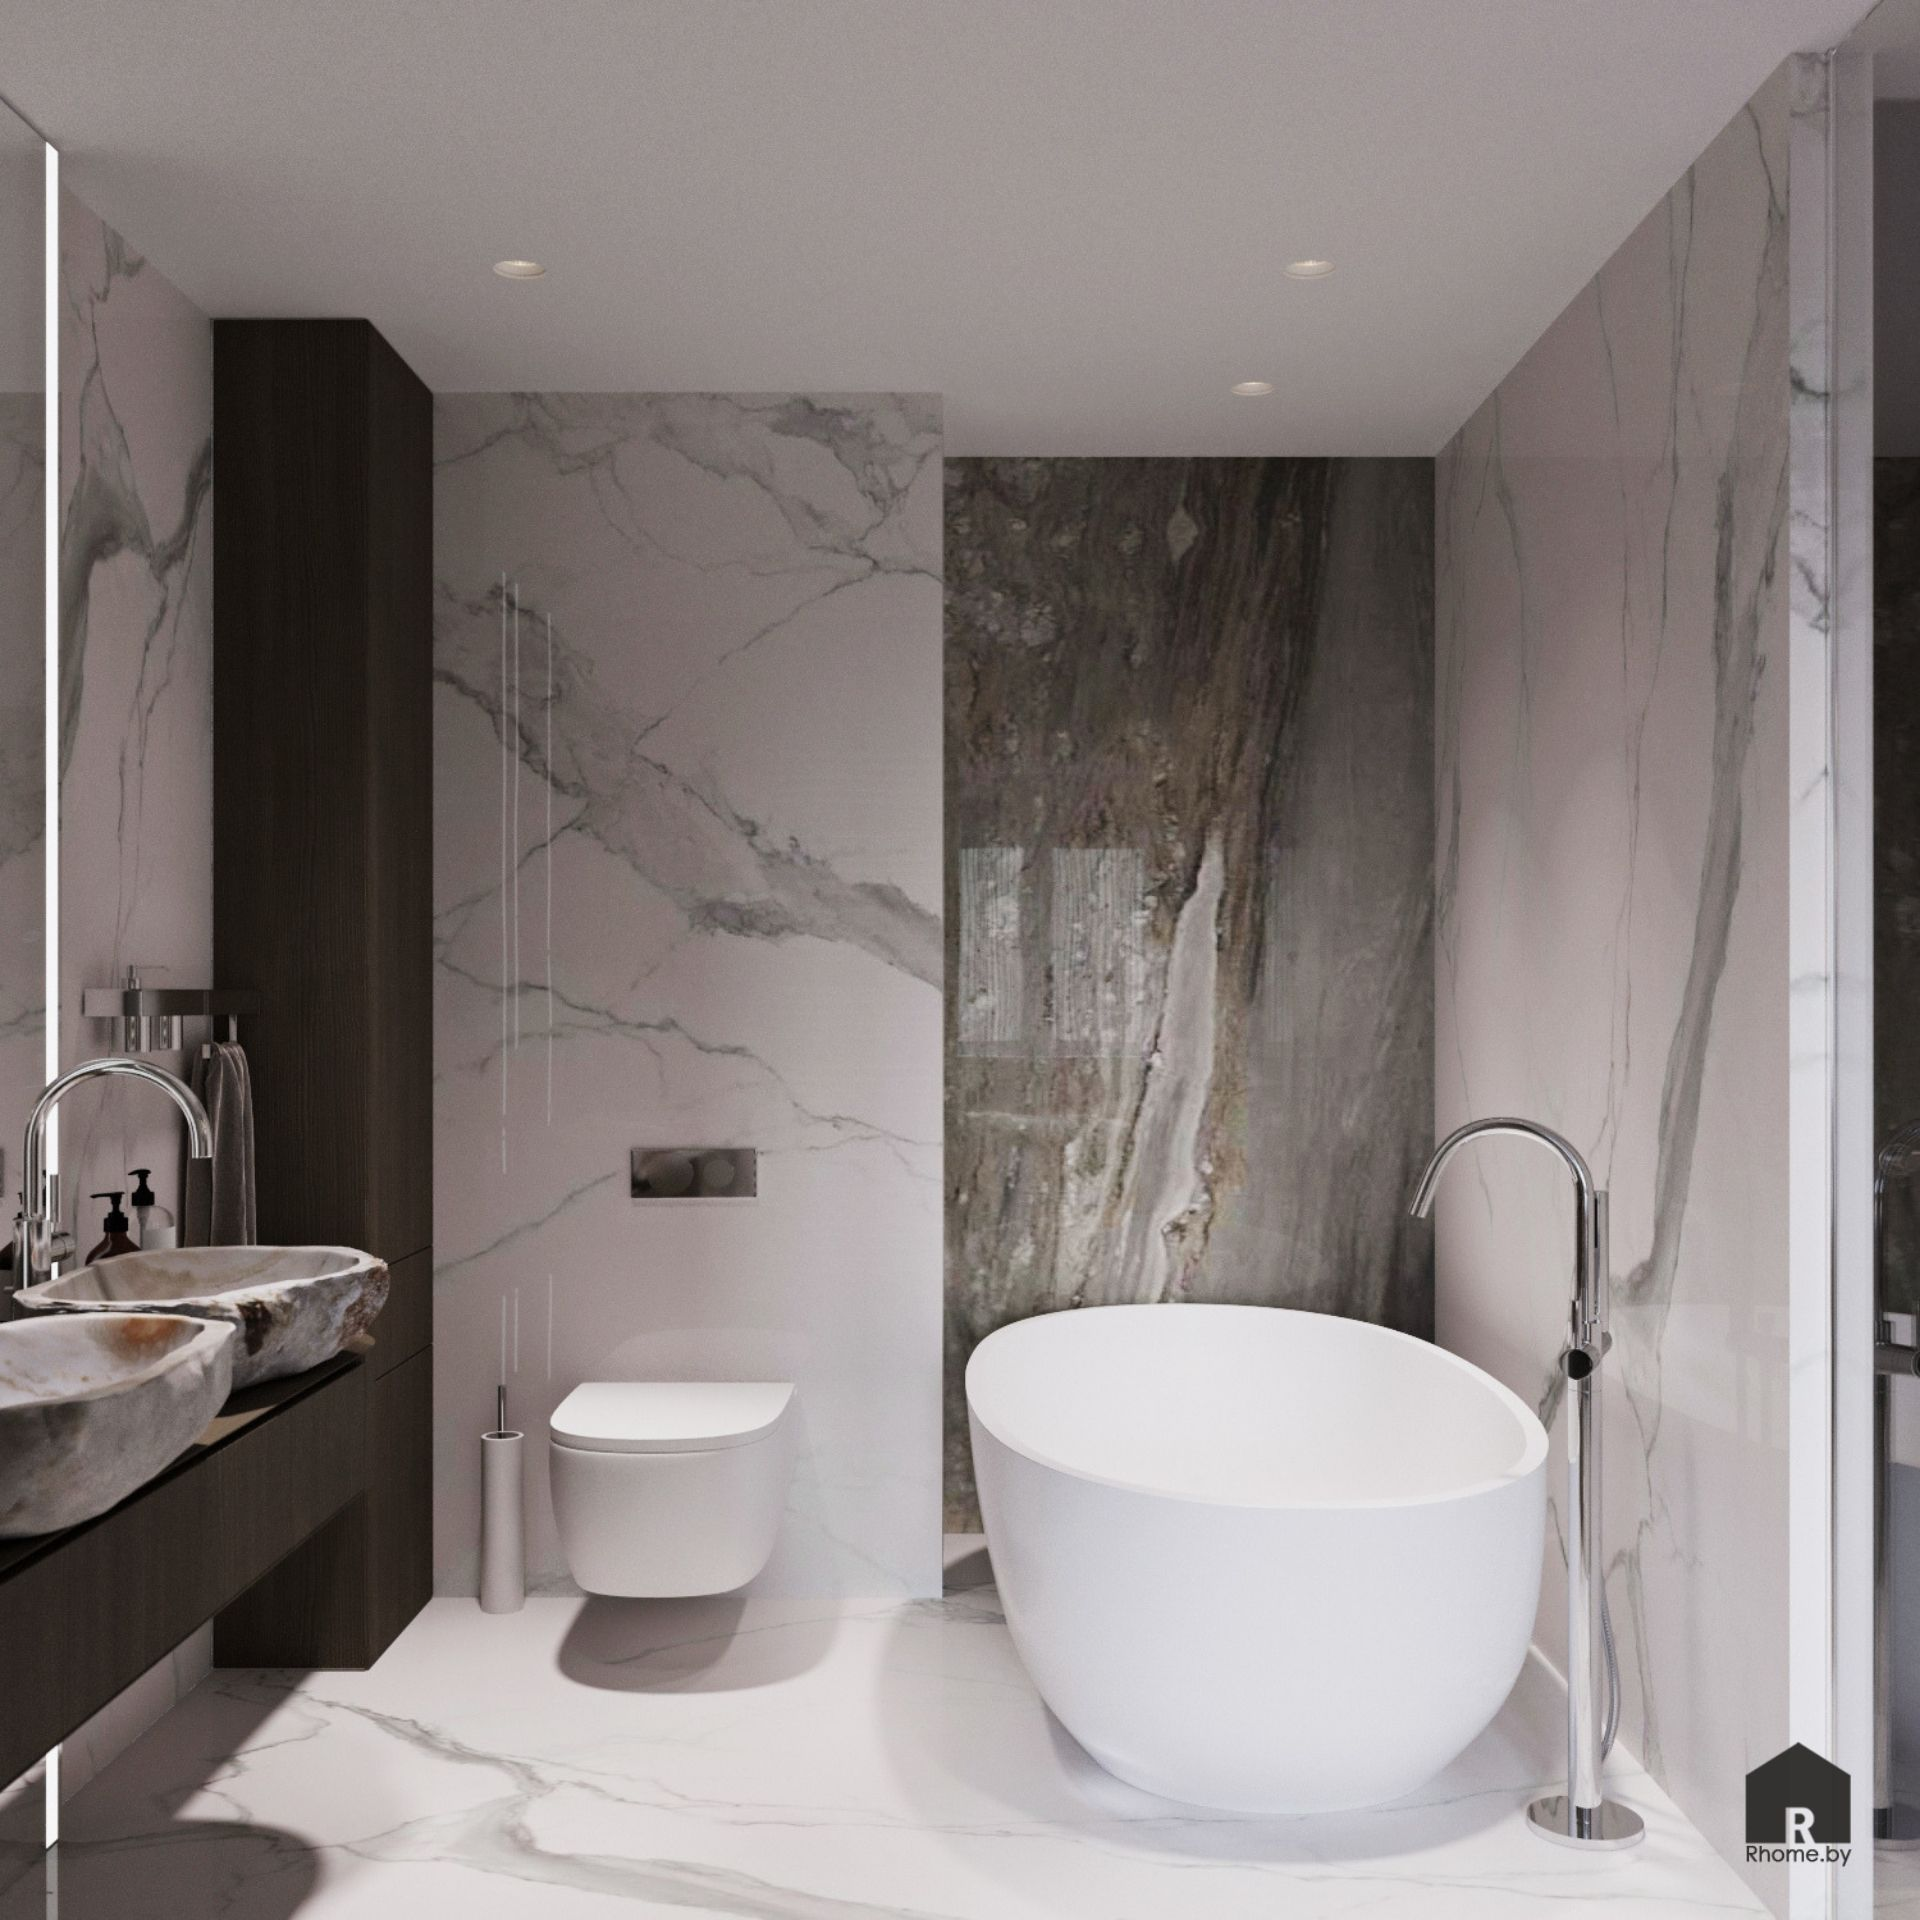 Светлая ванная комната с плиткой под камень